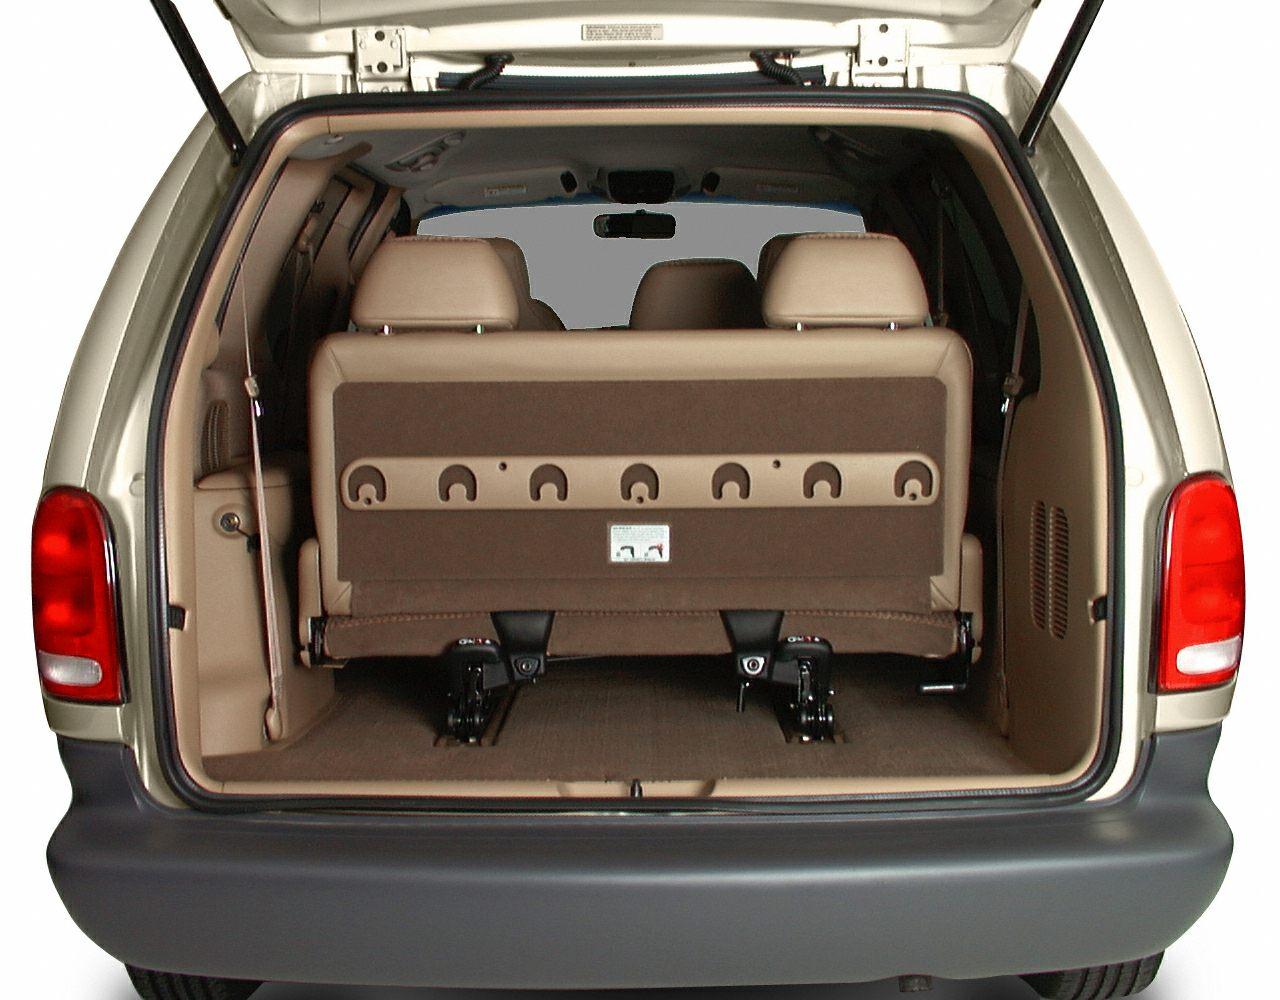 2000 Chrysler Grand Voyager Exterior Photo